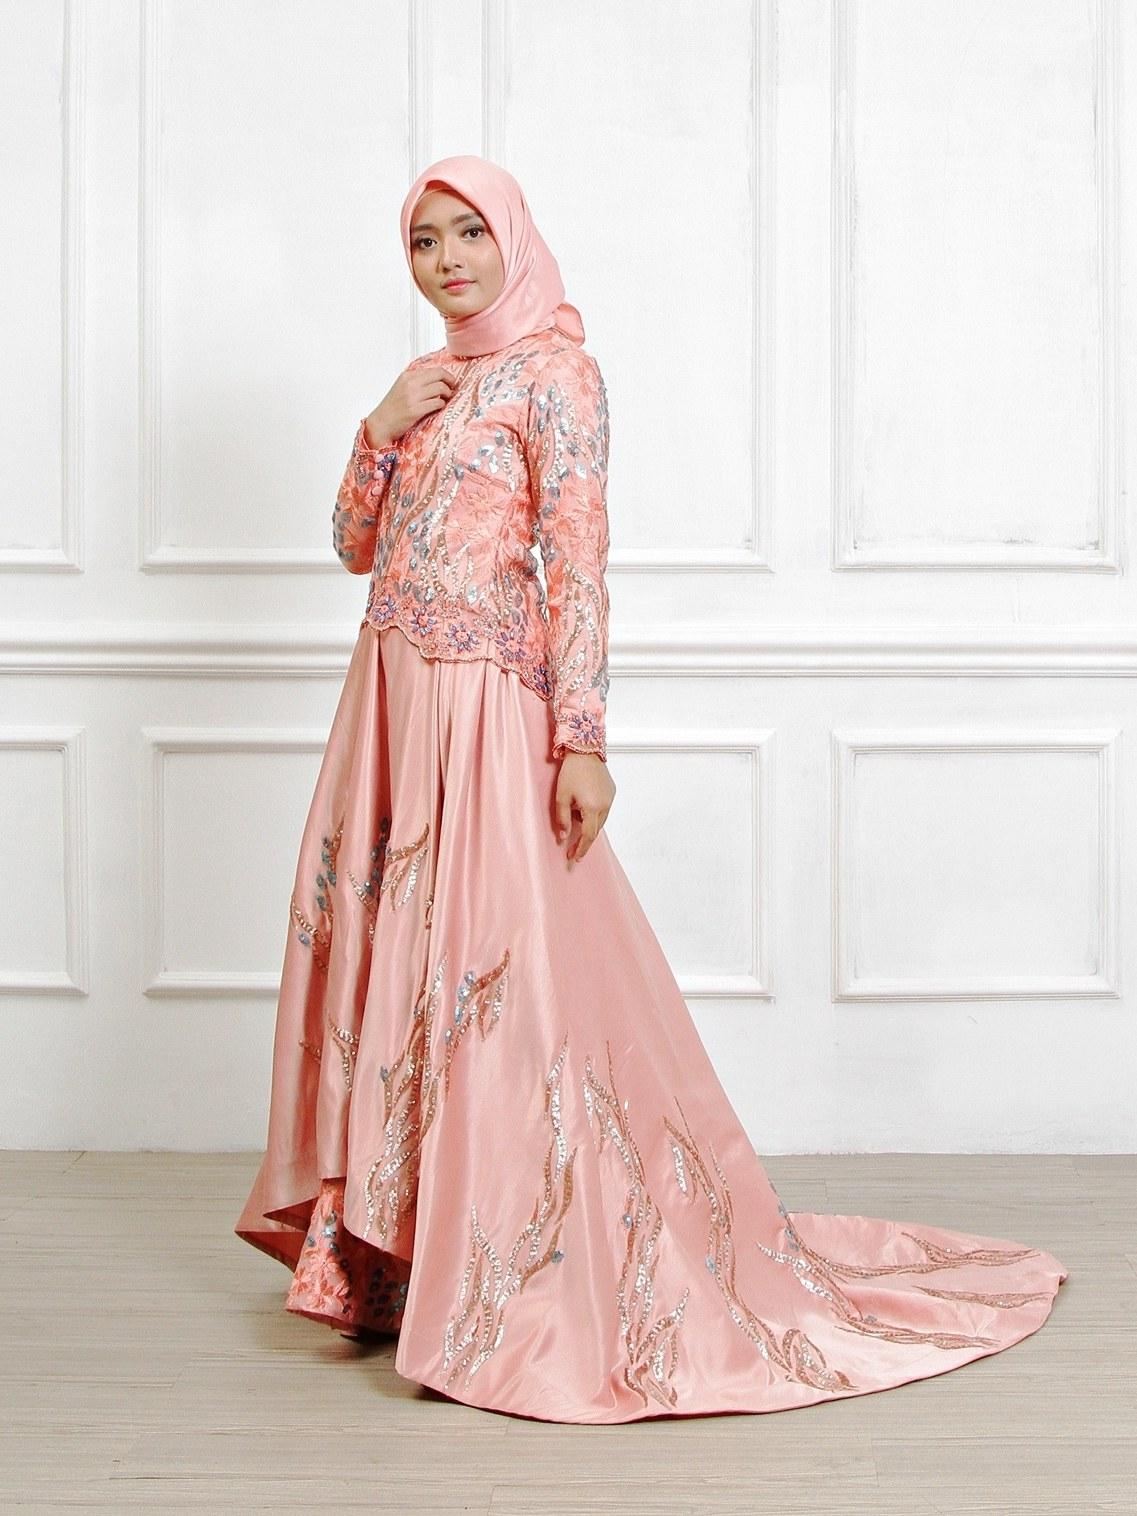 Model Sewa Baju Pengantin Muslimah Modern 4pde Gaun Pengantin Muslimah Dress Muslim Pungky Rumah Jahit